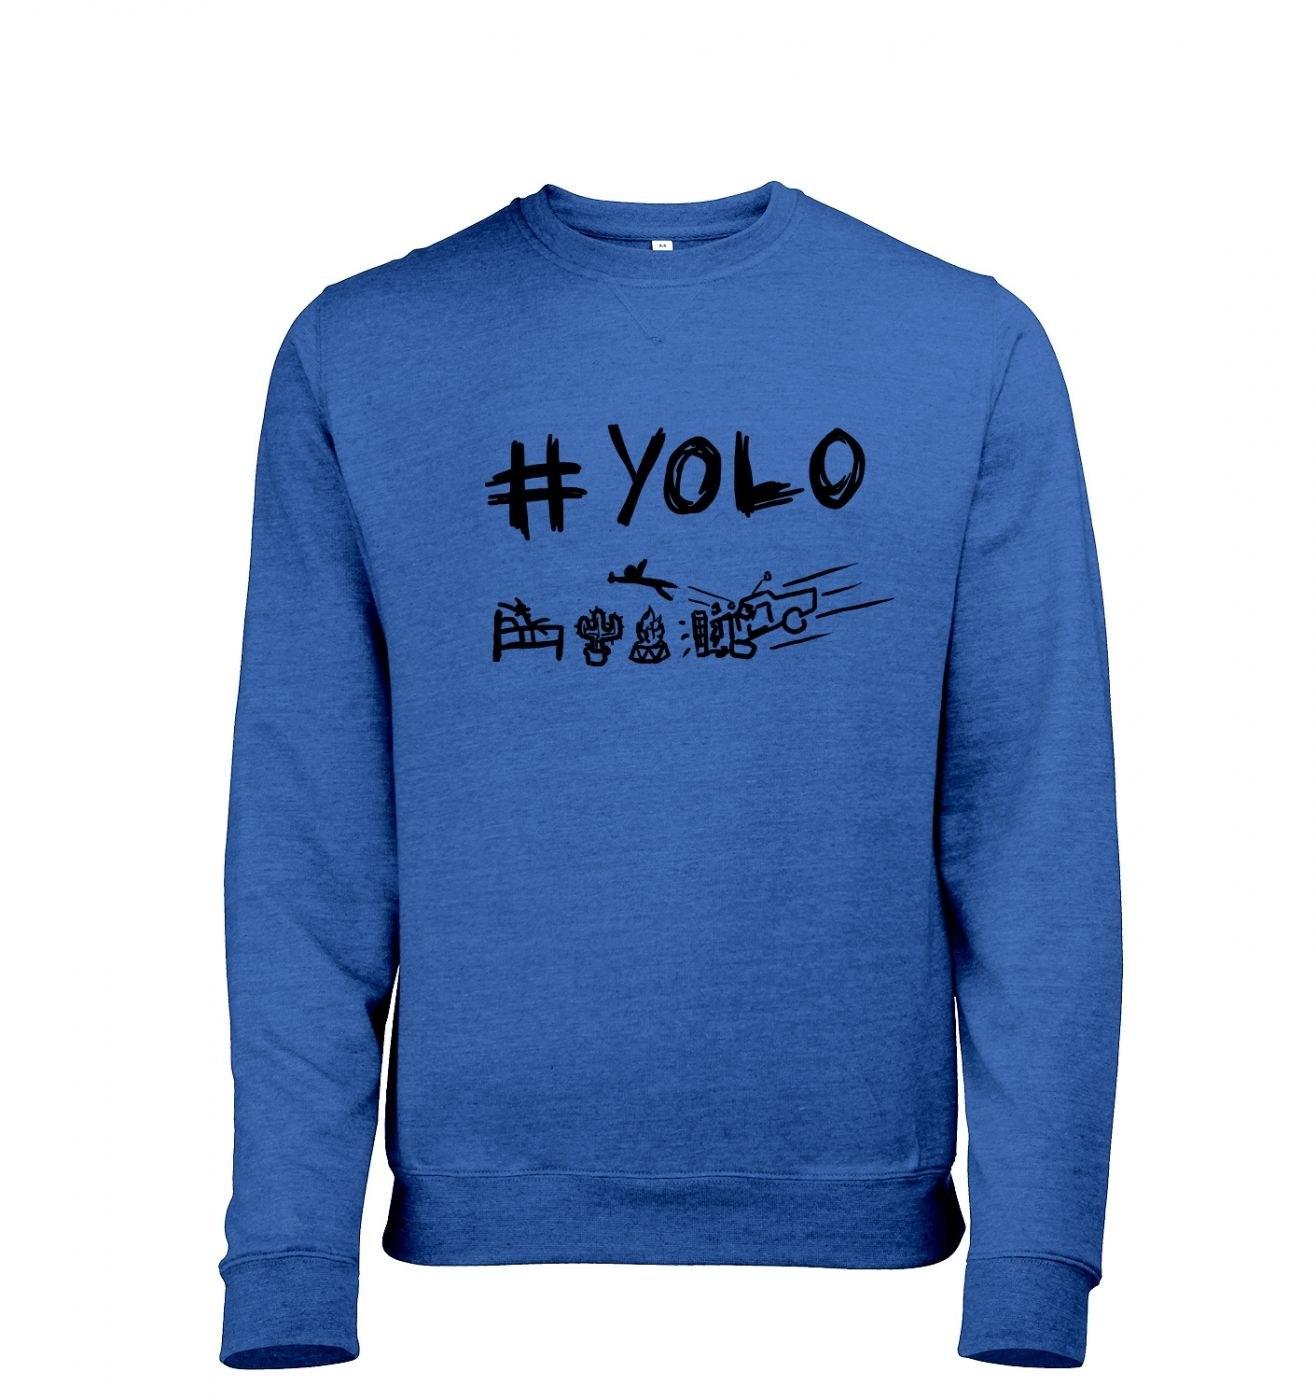 Adults' #yolo heather crewneck sweatshirt. You only live once